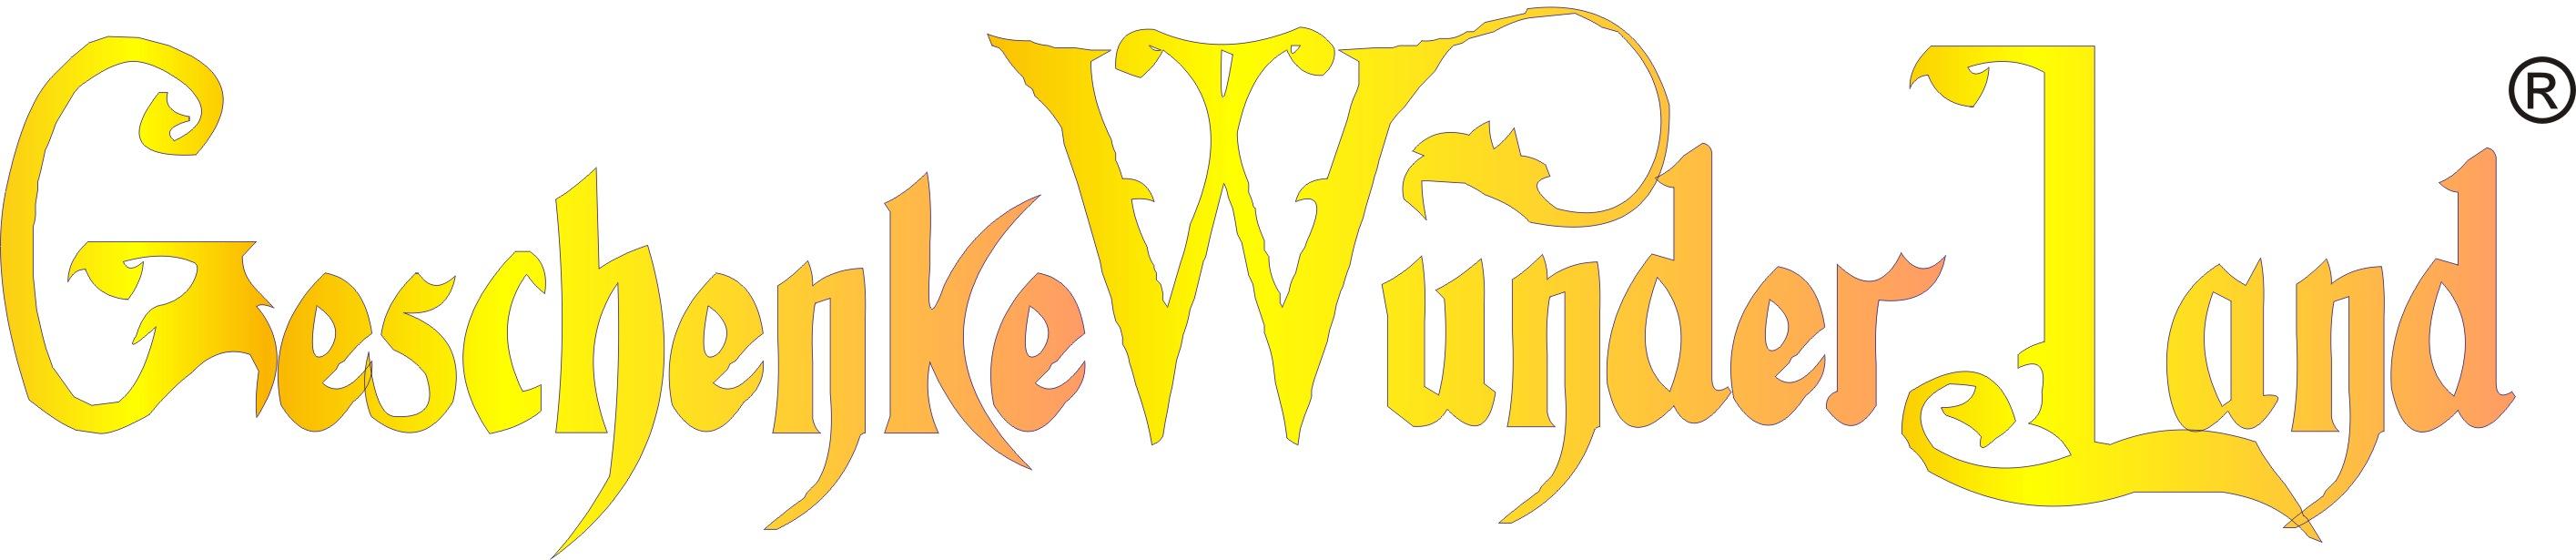 logo-geschenkewunderland